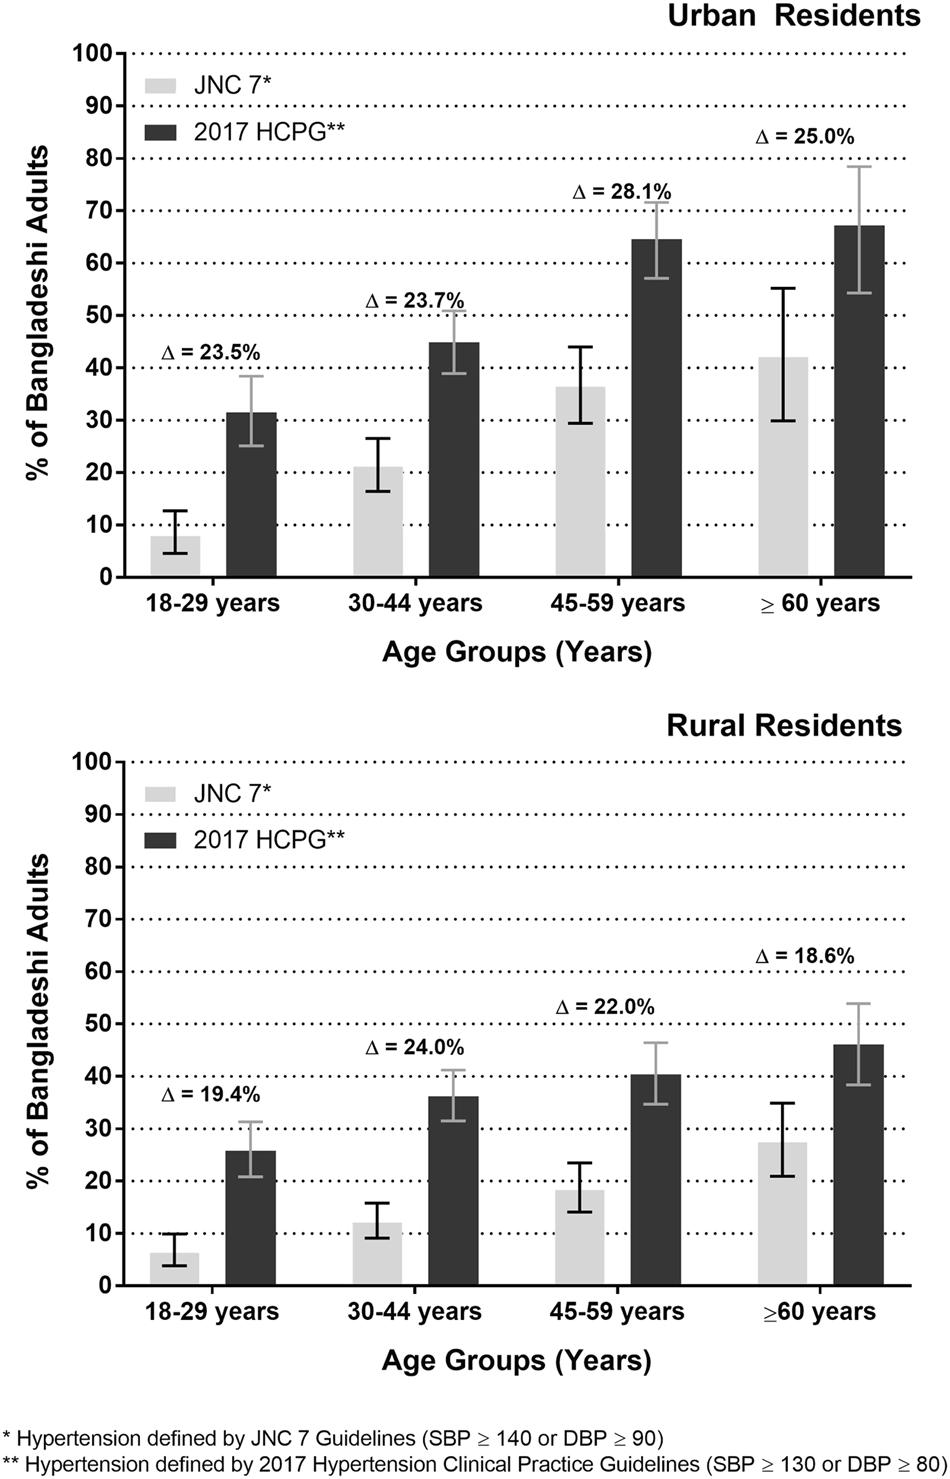 Epidemiology Of Hypertension Among Bangladeshi Adults Using The 2017